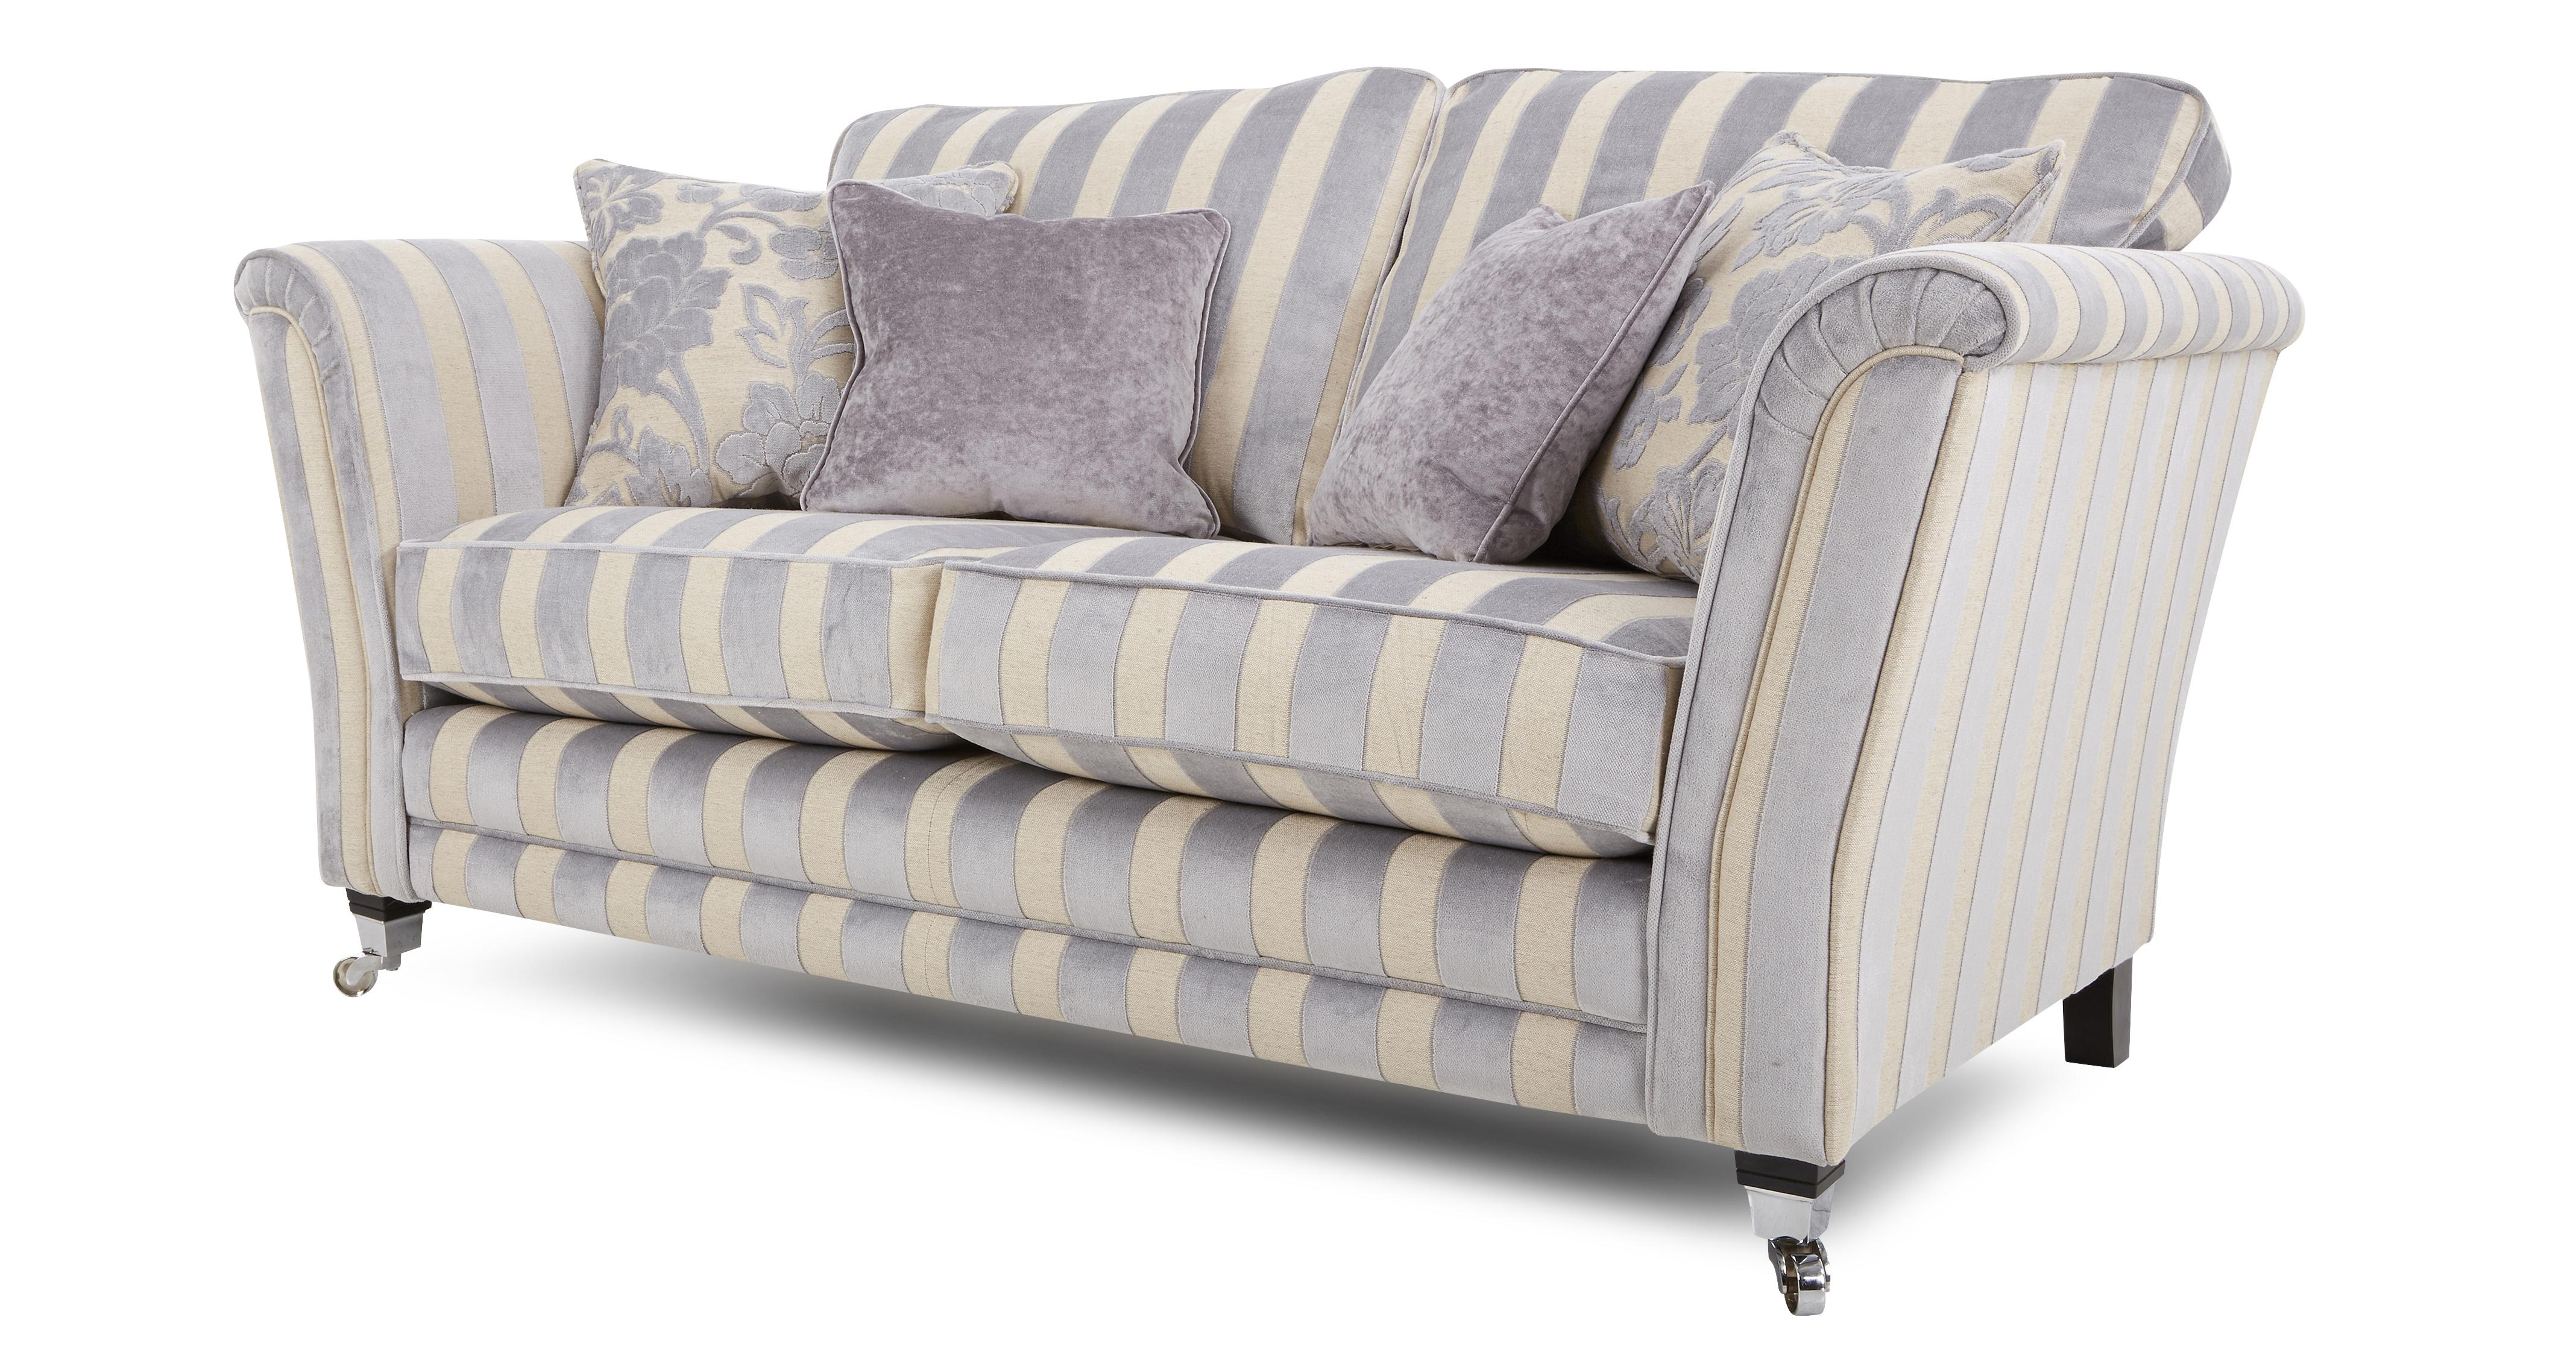 Dfs Silver Fabric Hogarth Sofa Set Inc Stripe 2 Seater